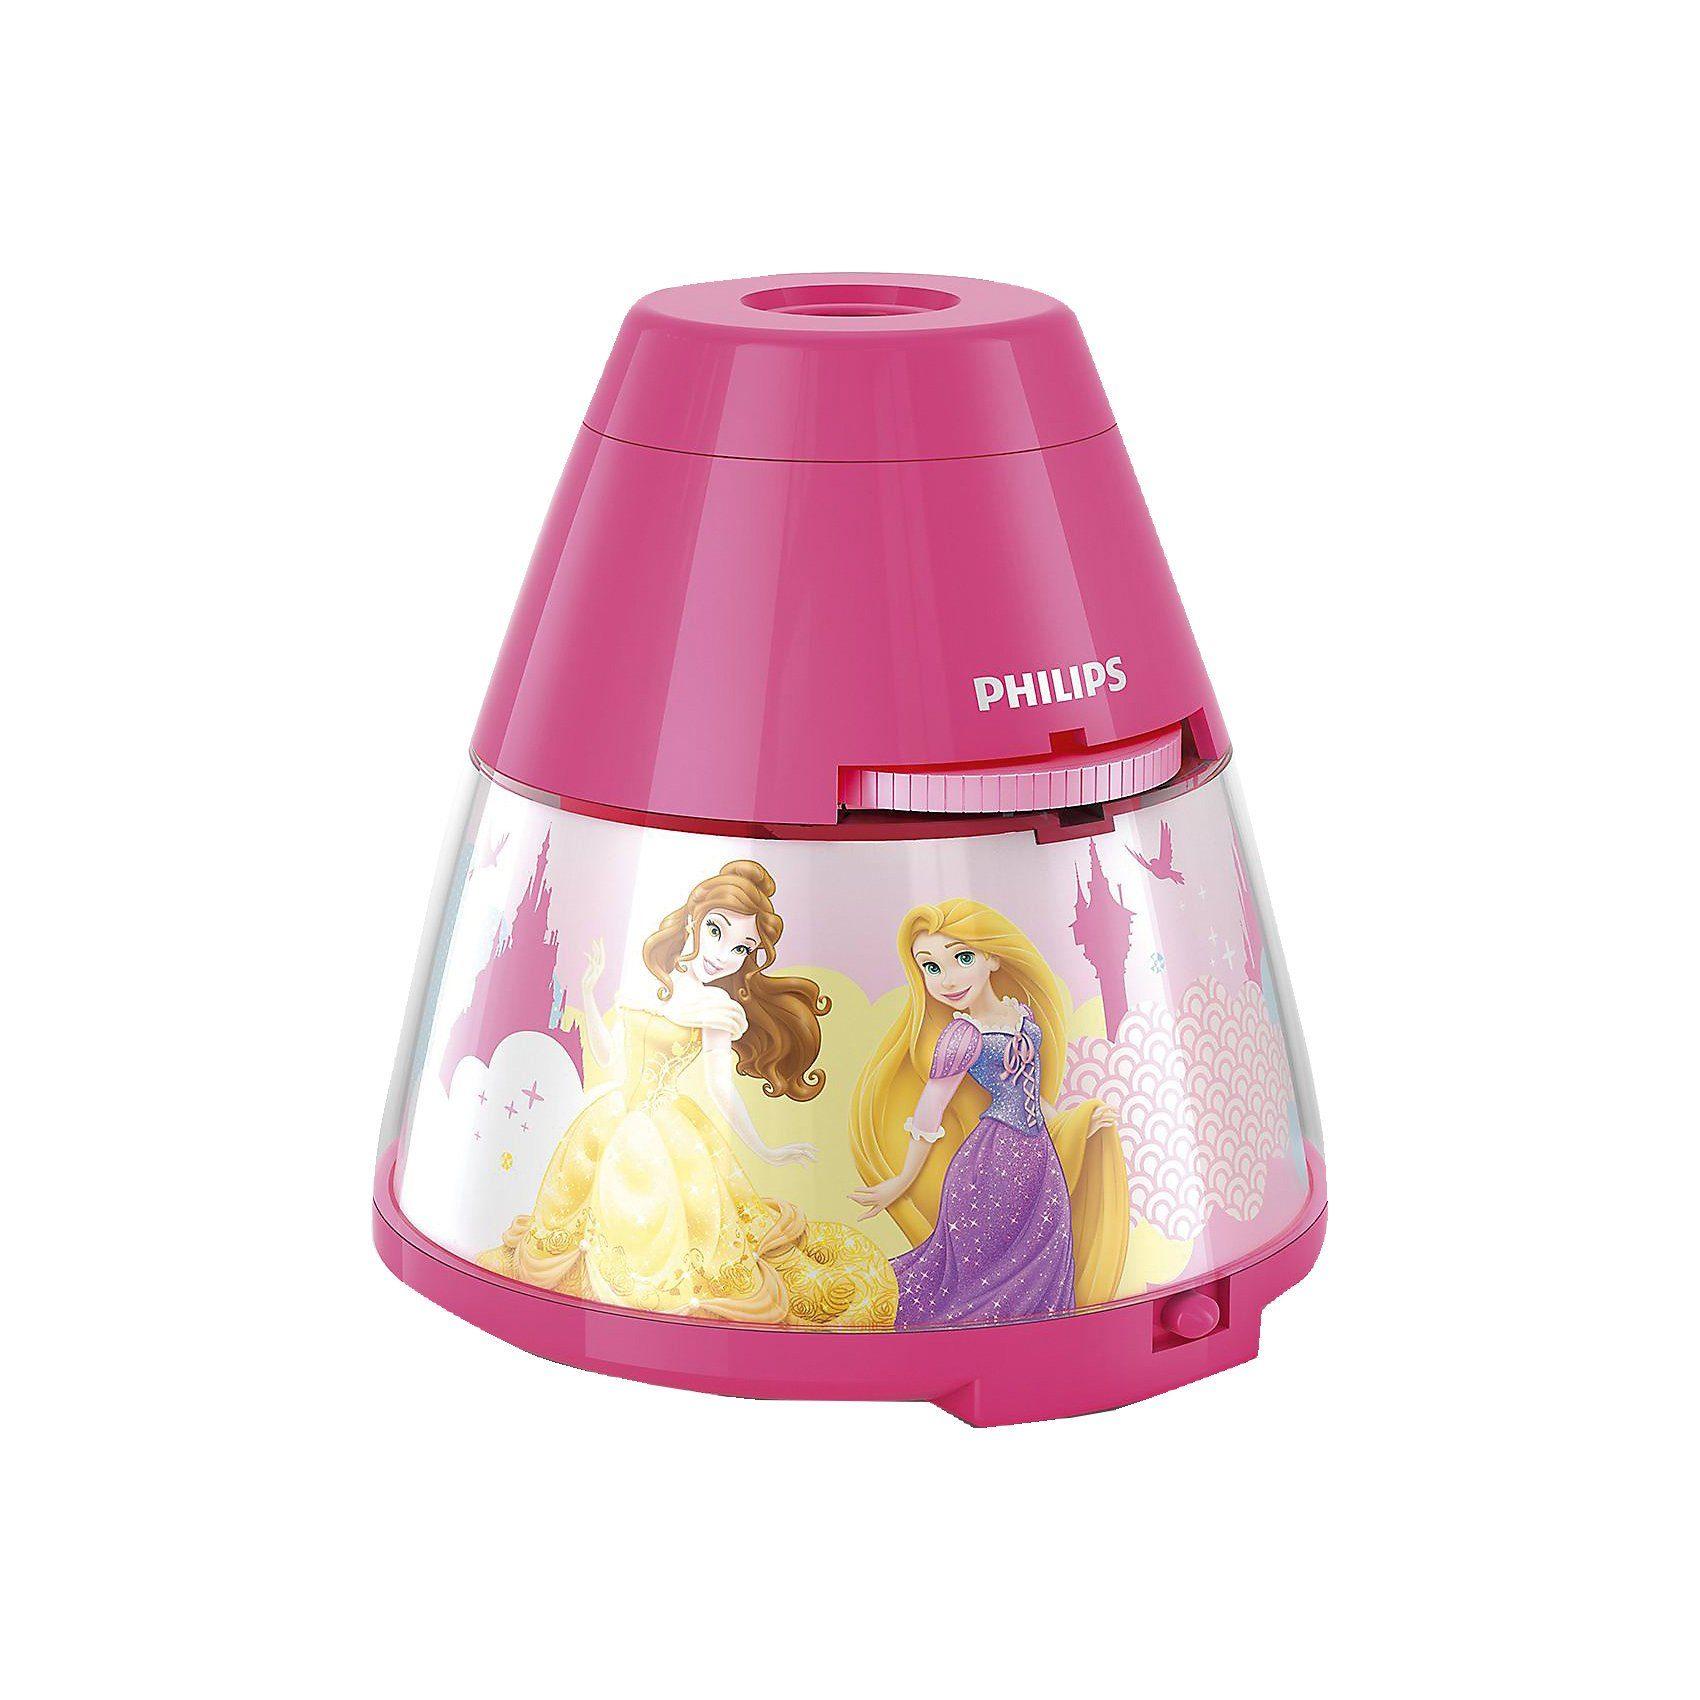 Philips Lighting Projektor Tischlampe, Disney Princess, LED